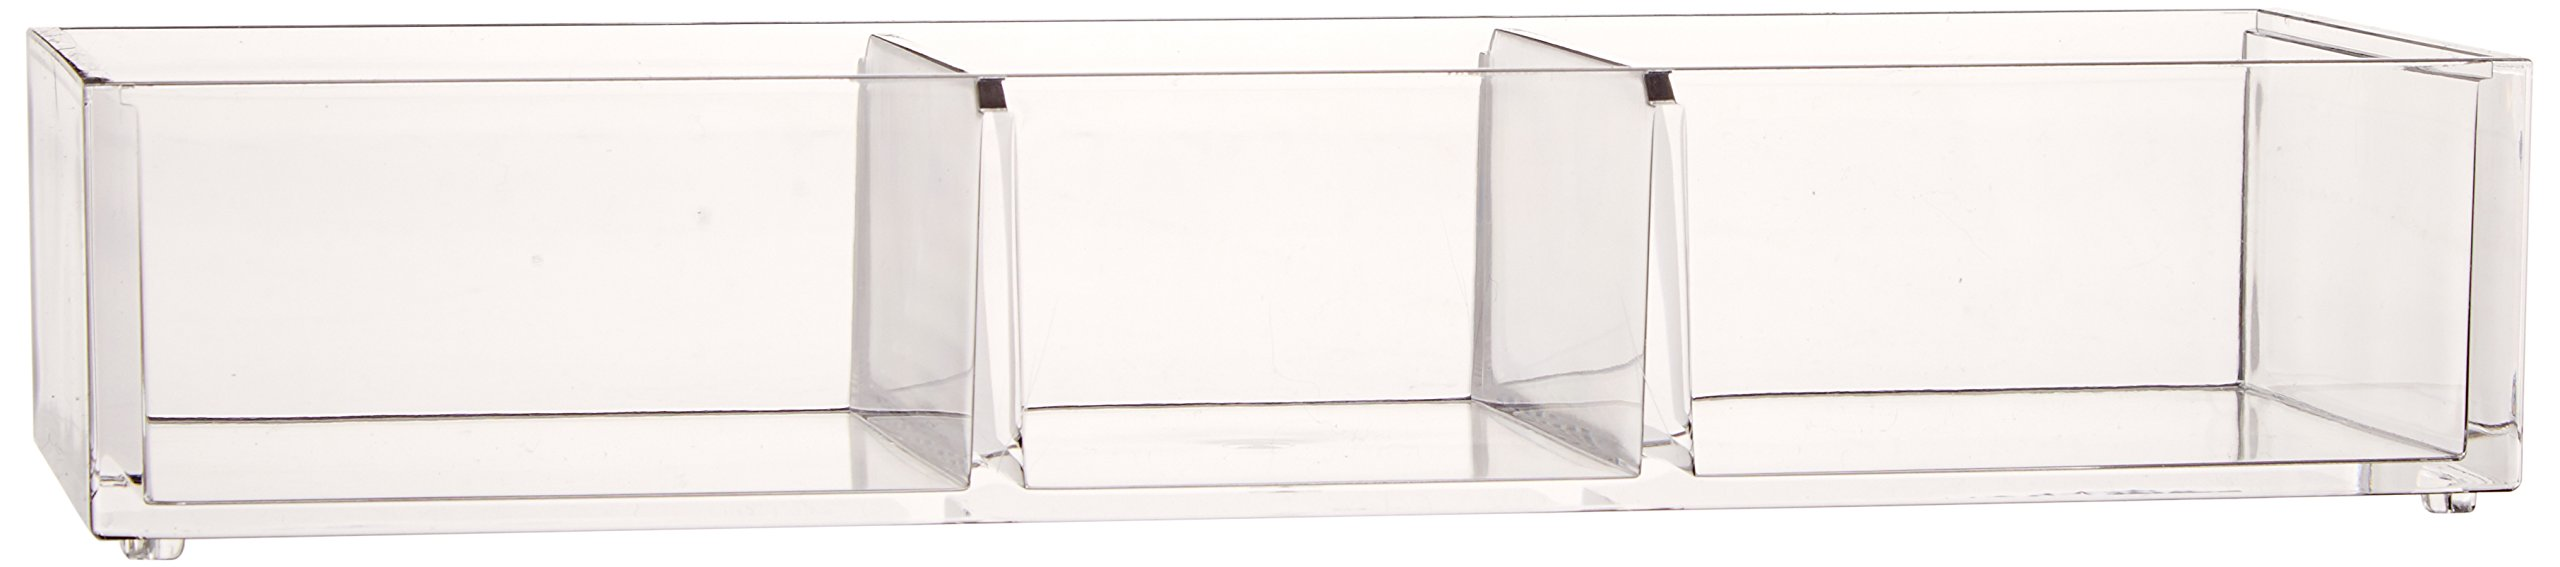 Danielle Enterprises Acrylic Base Compartment Organizer, Clear